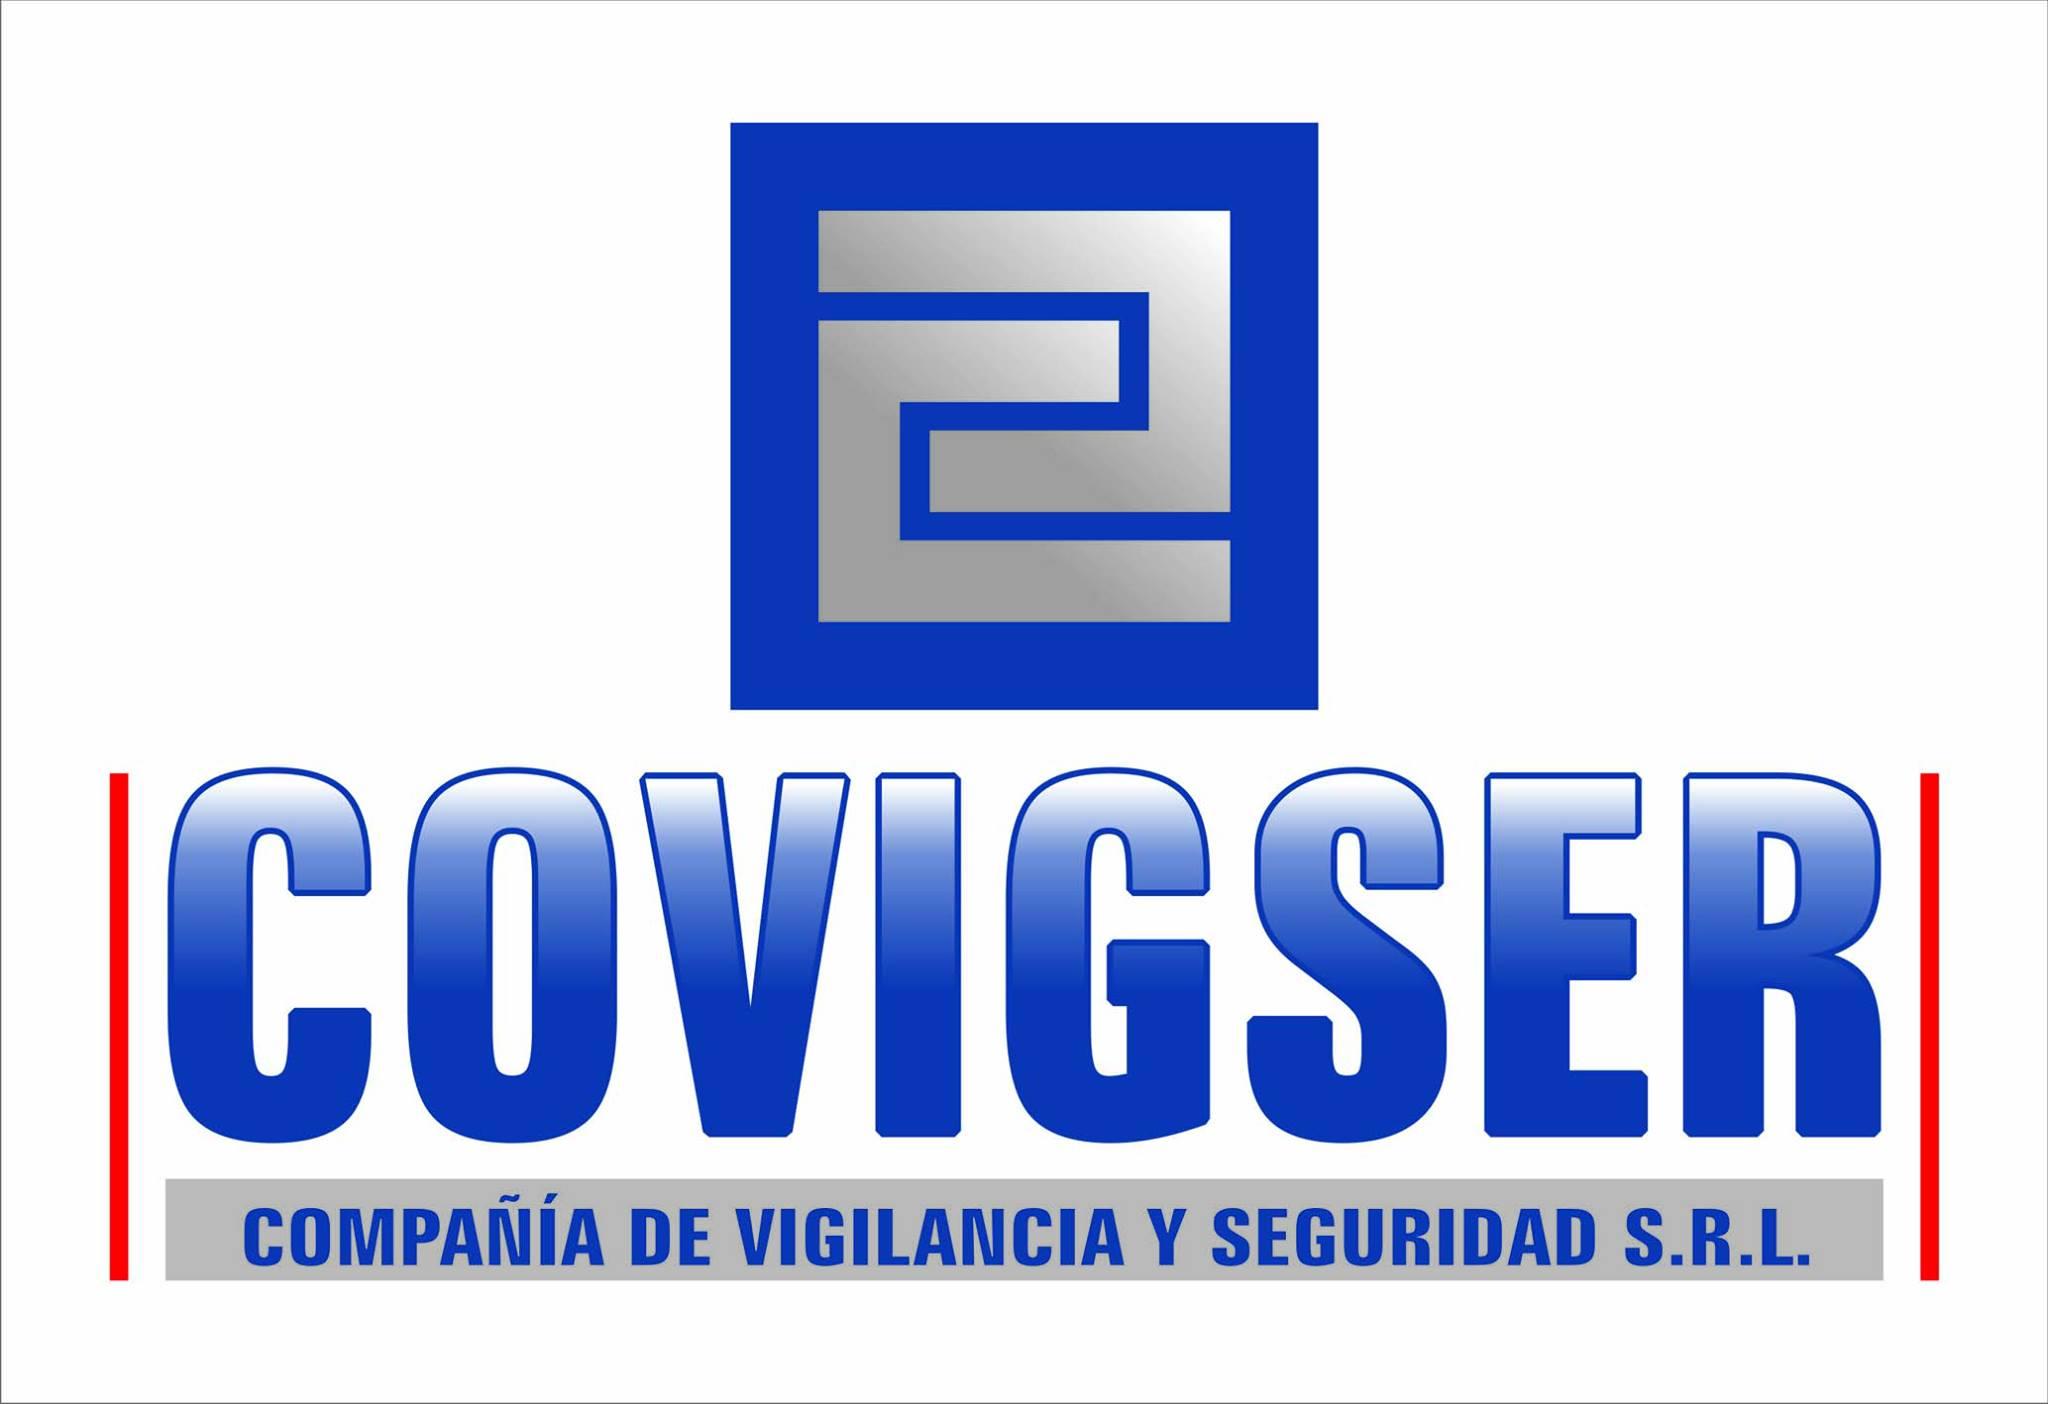 COVIGSER